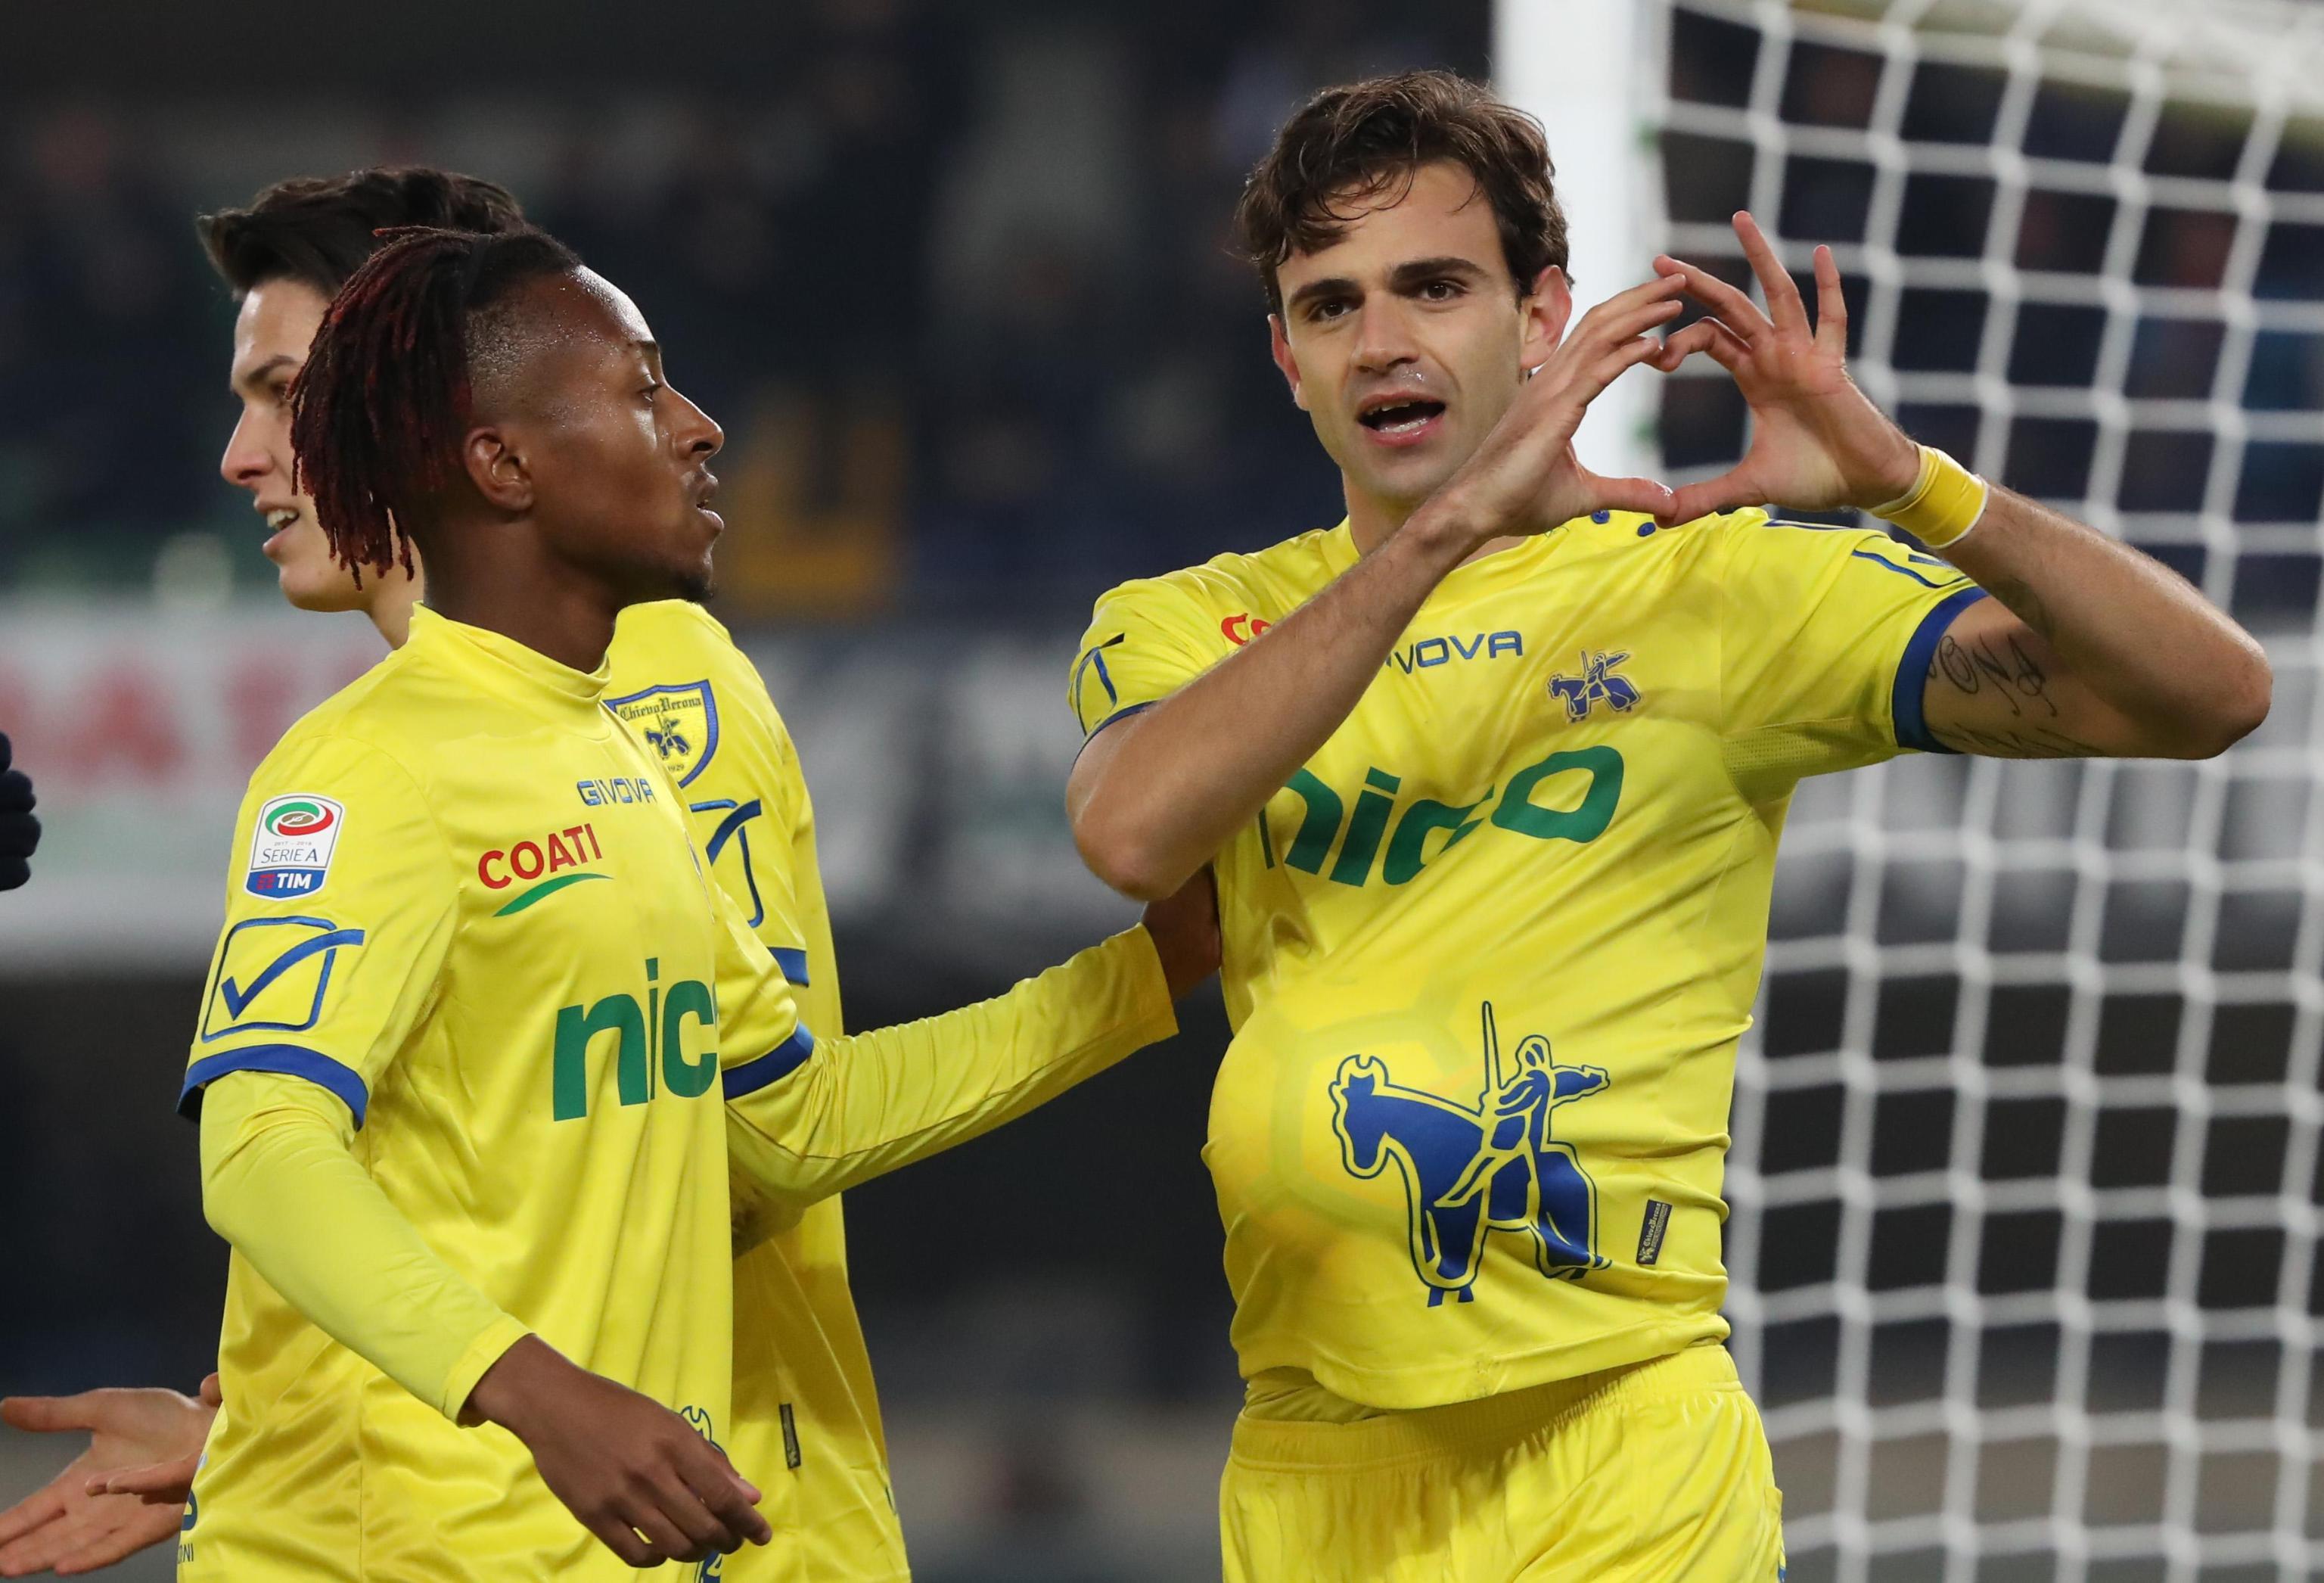 Serie A: Chievo-Udinese 1-1